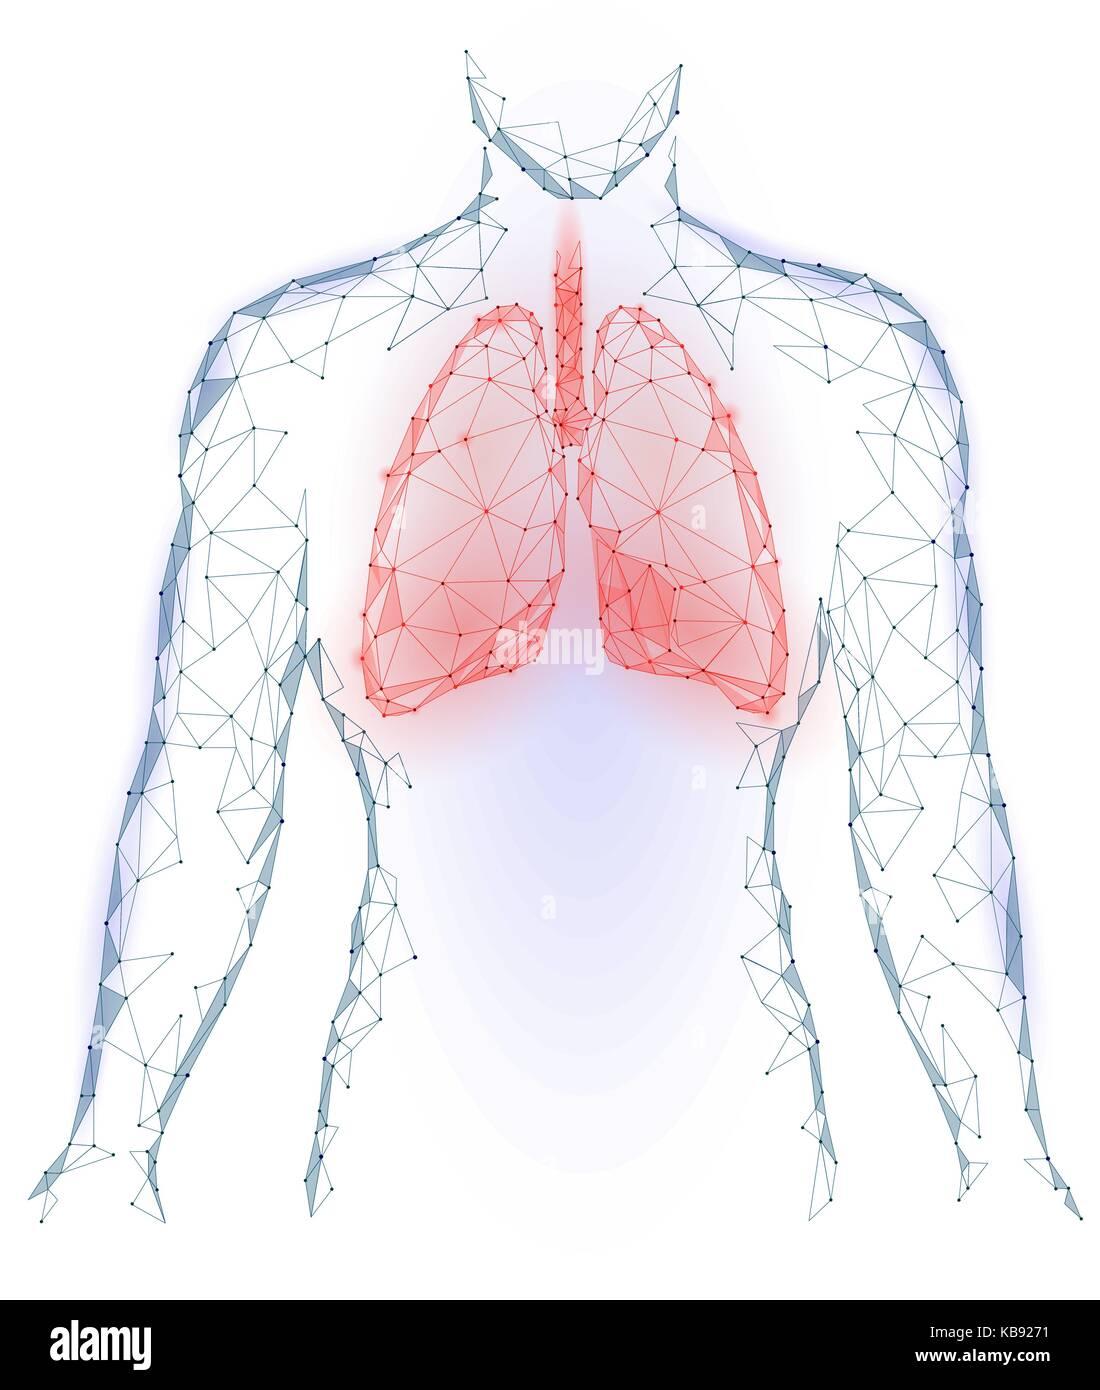 Human Respiratory System Imágenes De Stock & Human Respiratory ...